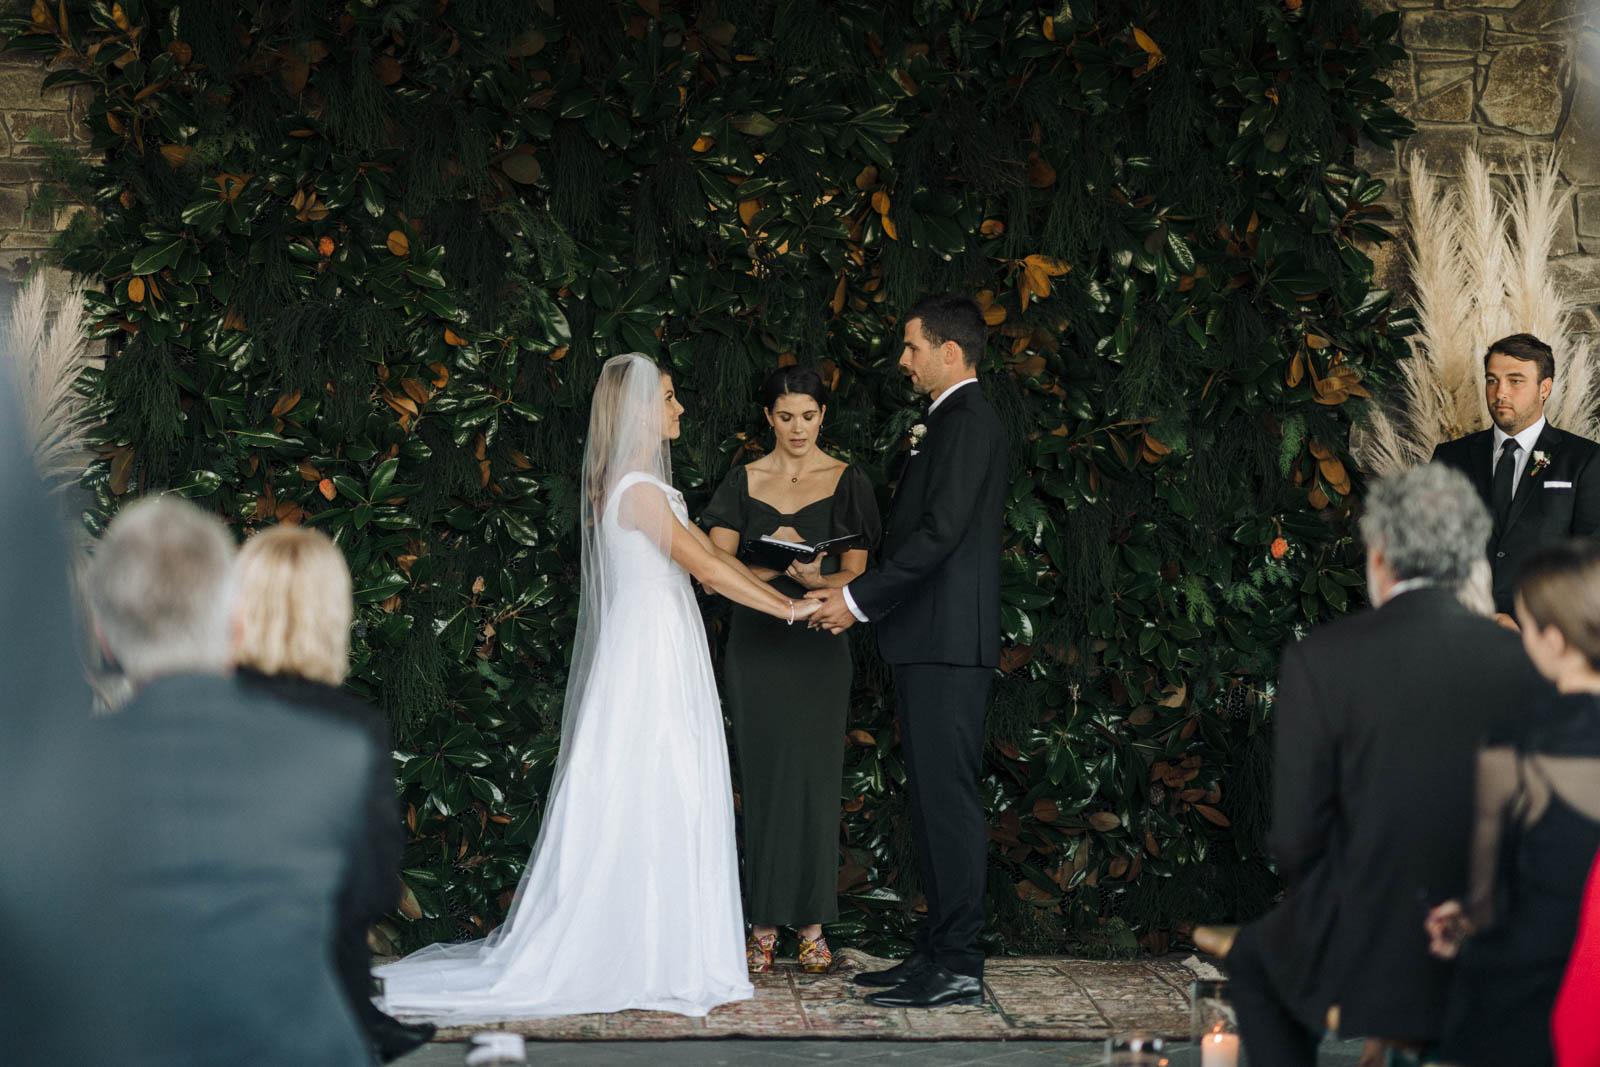 newfound-s-p-mt-maunganui-tauranga-wedding-photographer-1700-A9_06217